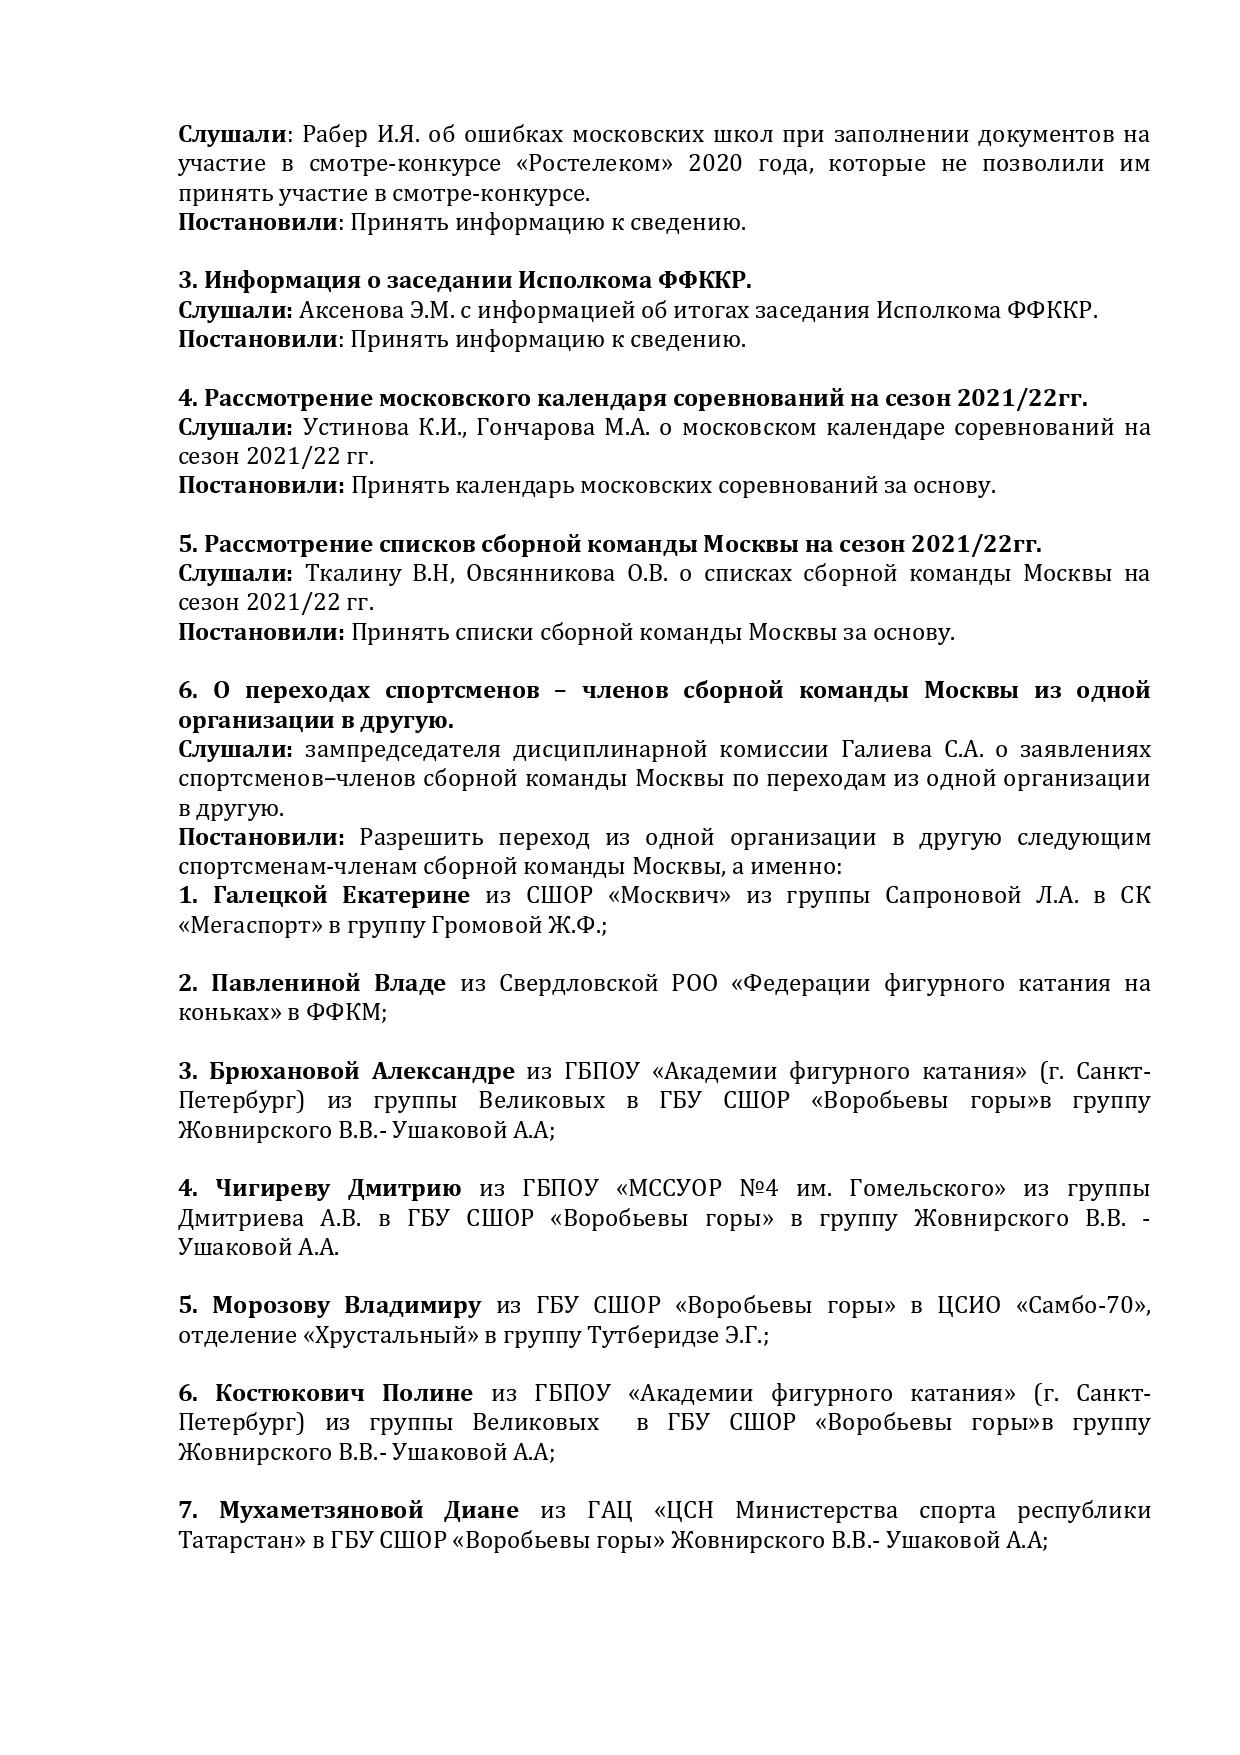 https://i.ibb.co/pwJX84V/Protokol-Presidium-27-05-2021-1-page-0002.jpg